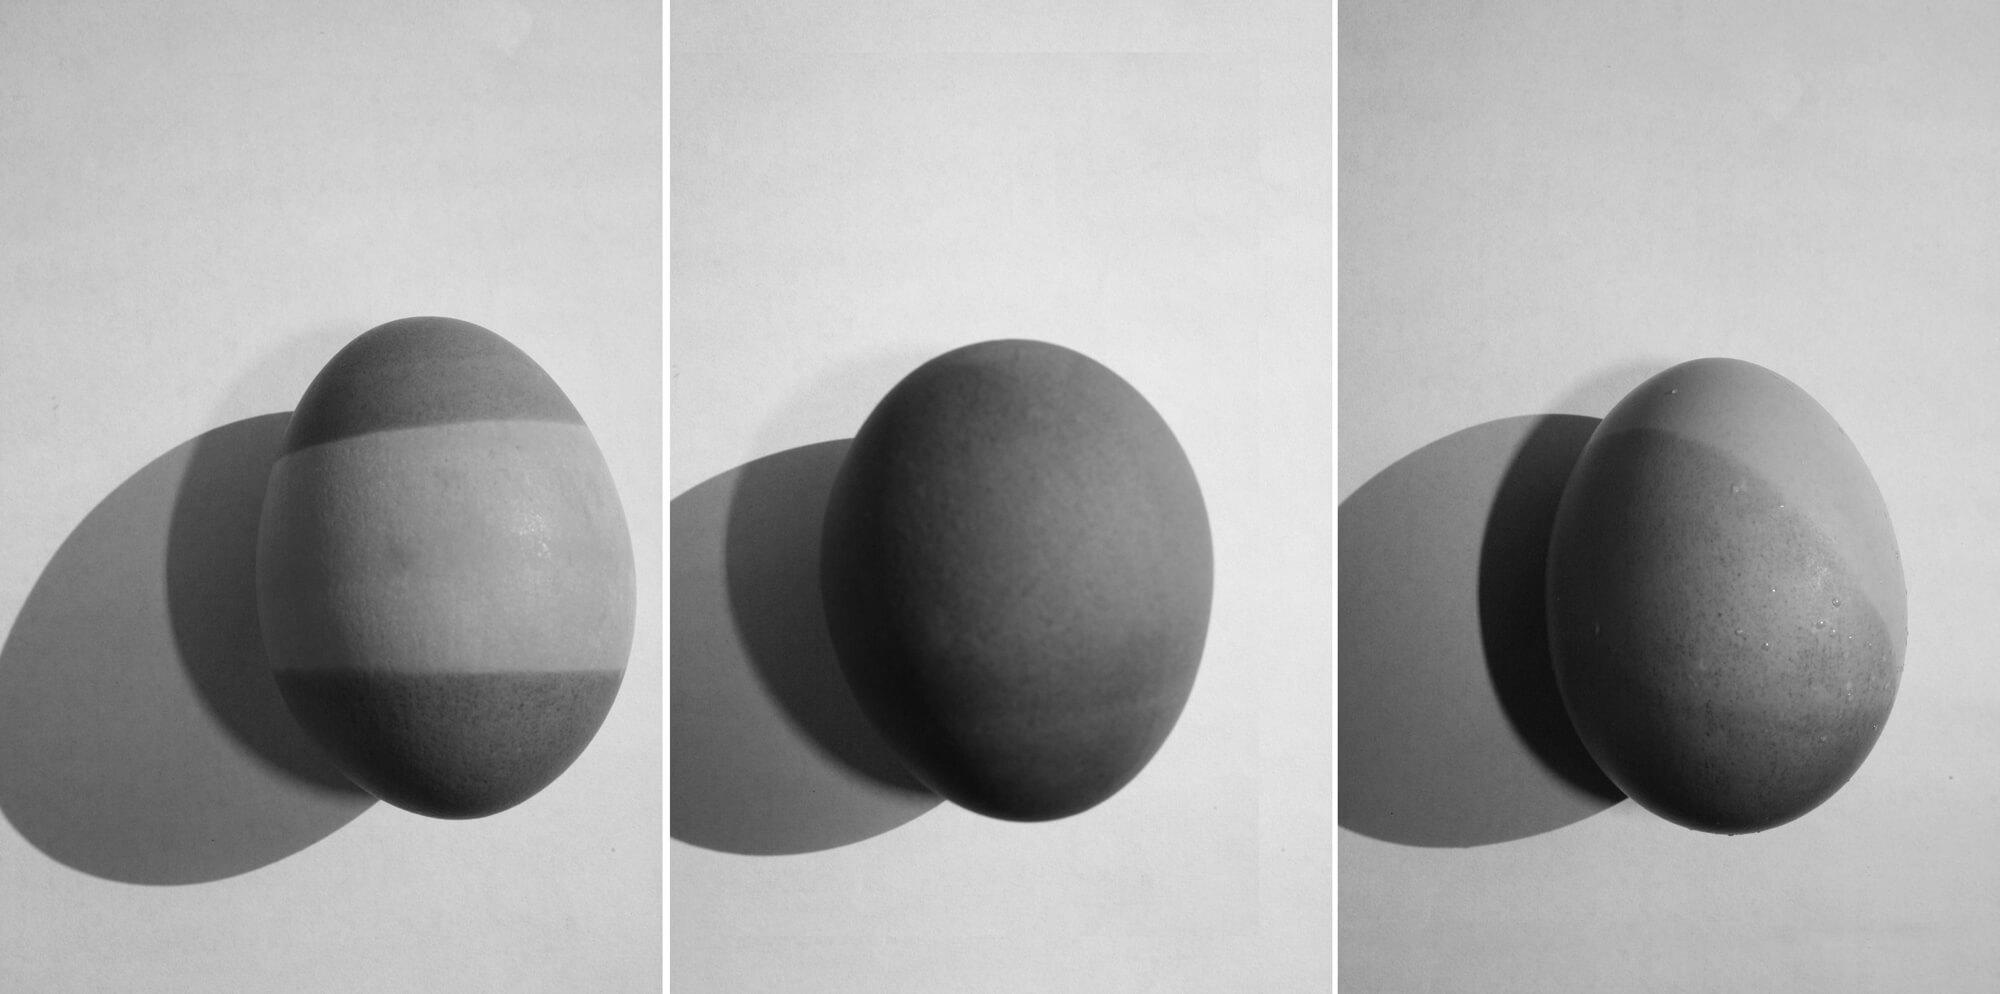 black and white geometric eggs